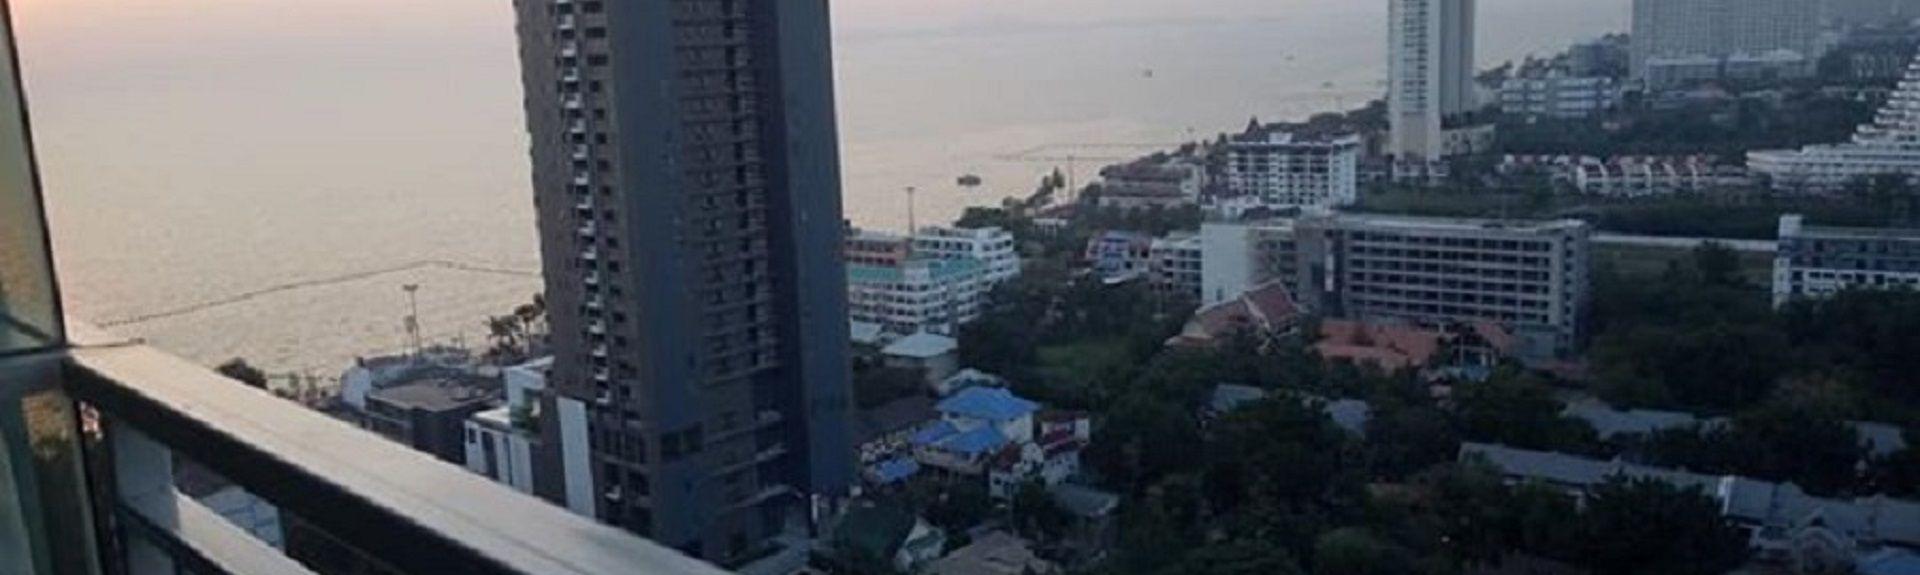 Pattayan ranta, Pattaya, Chonburi, Thaimaa